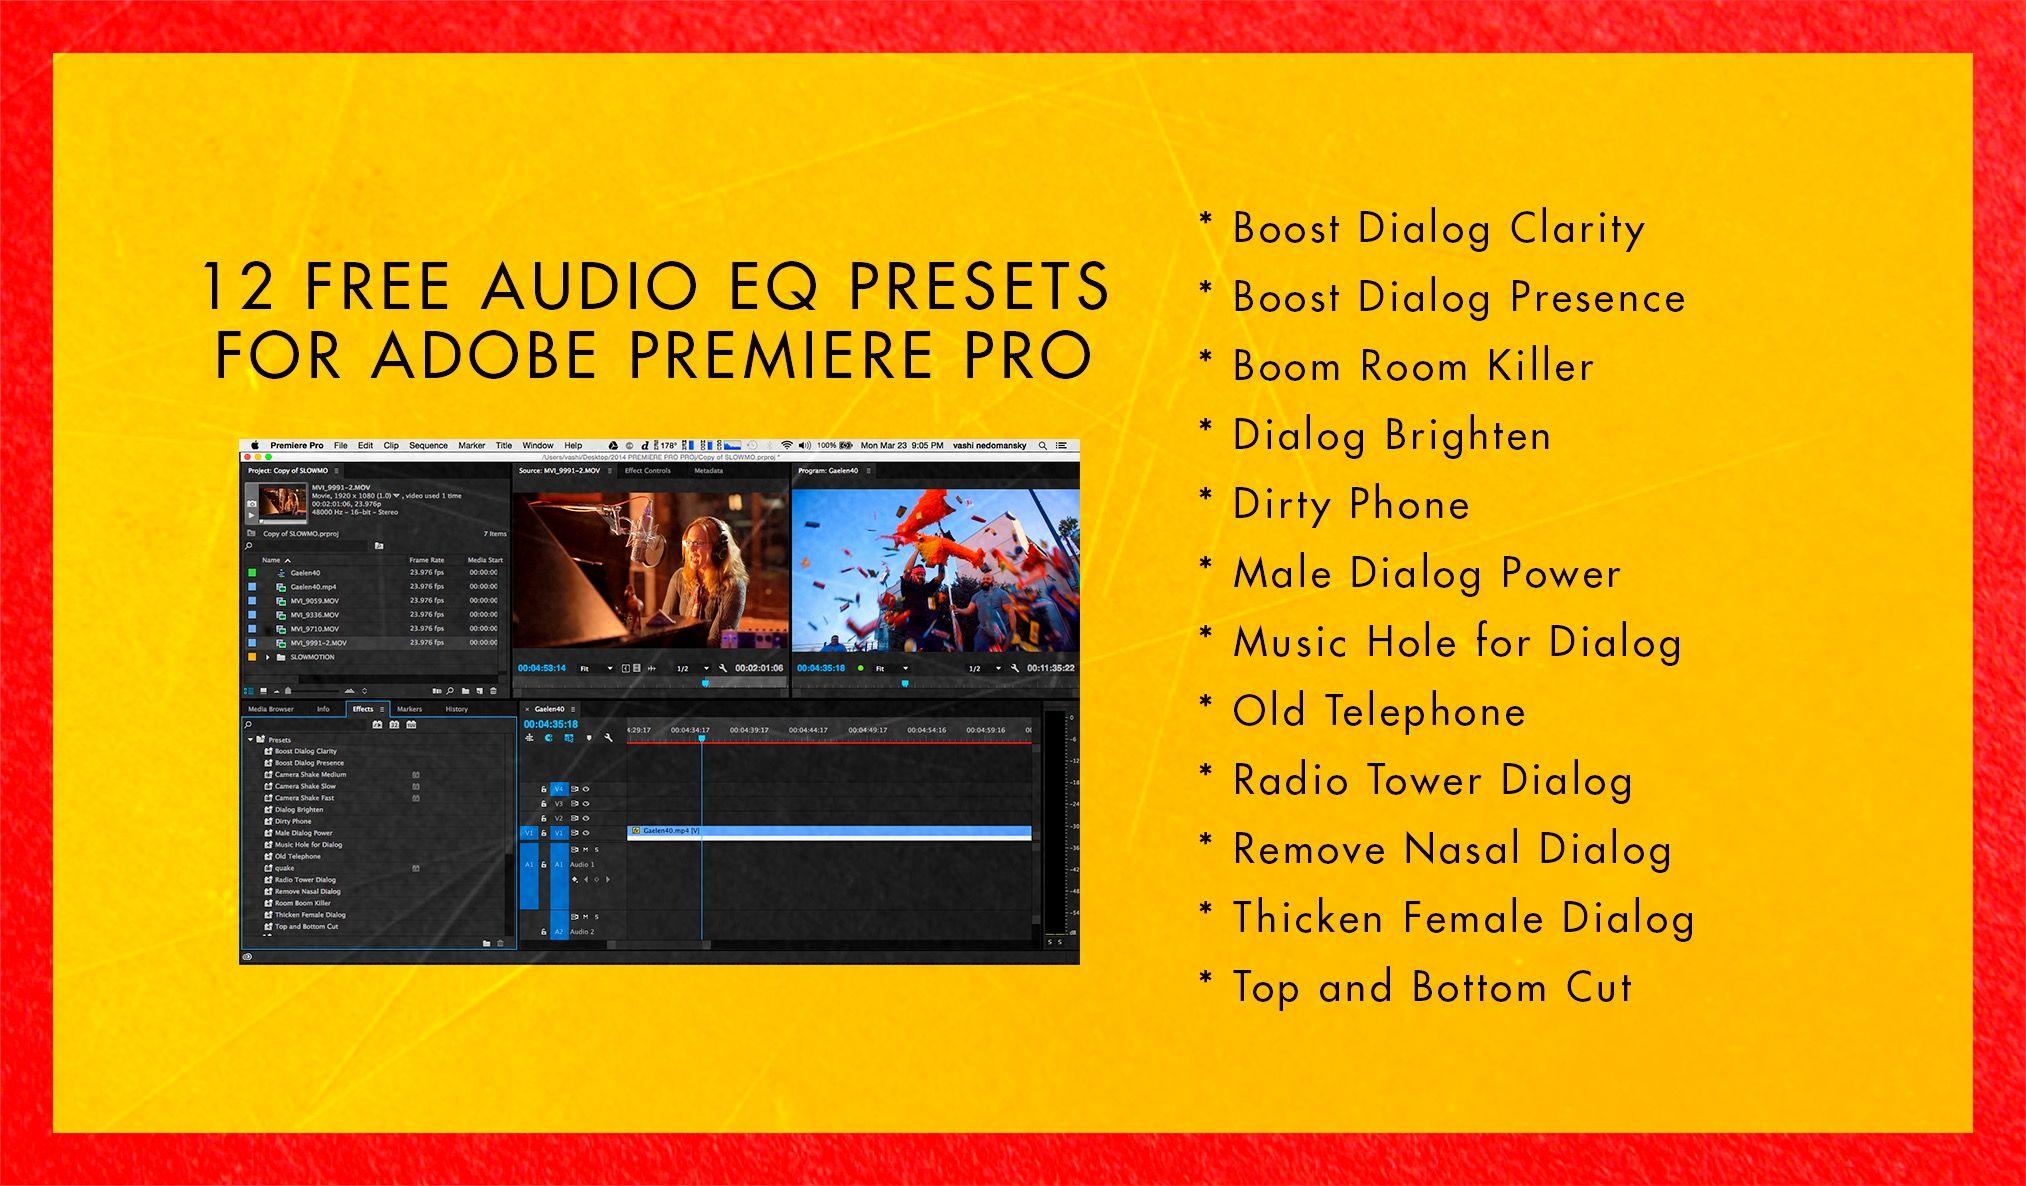 12 Free Audio Presets for Adobe Premiere Pro. http